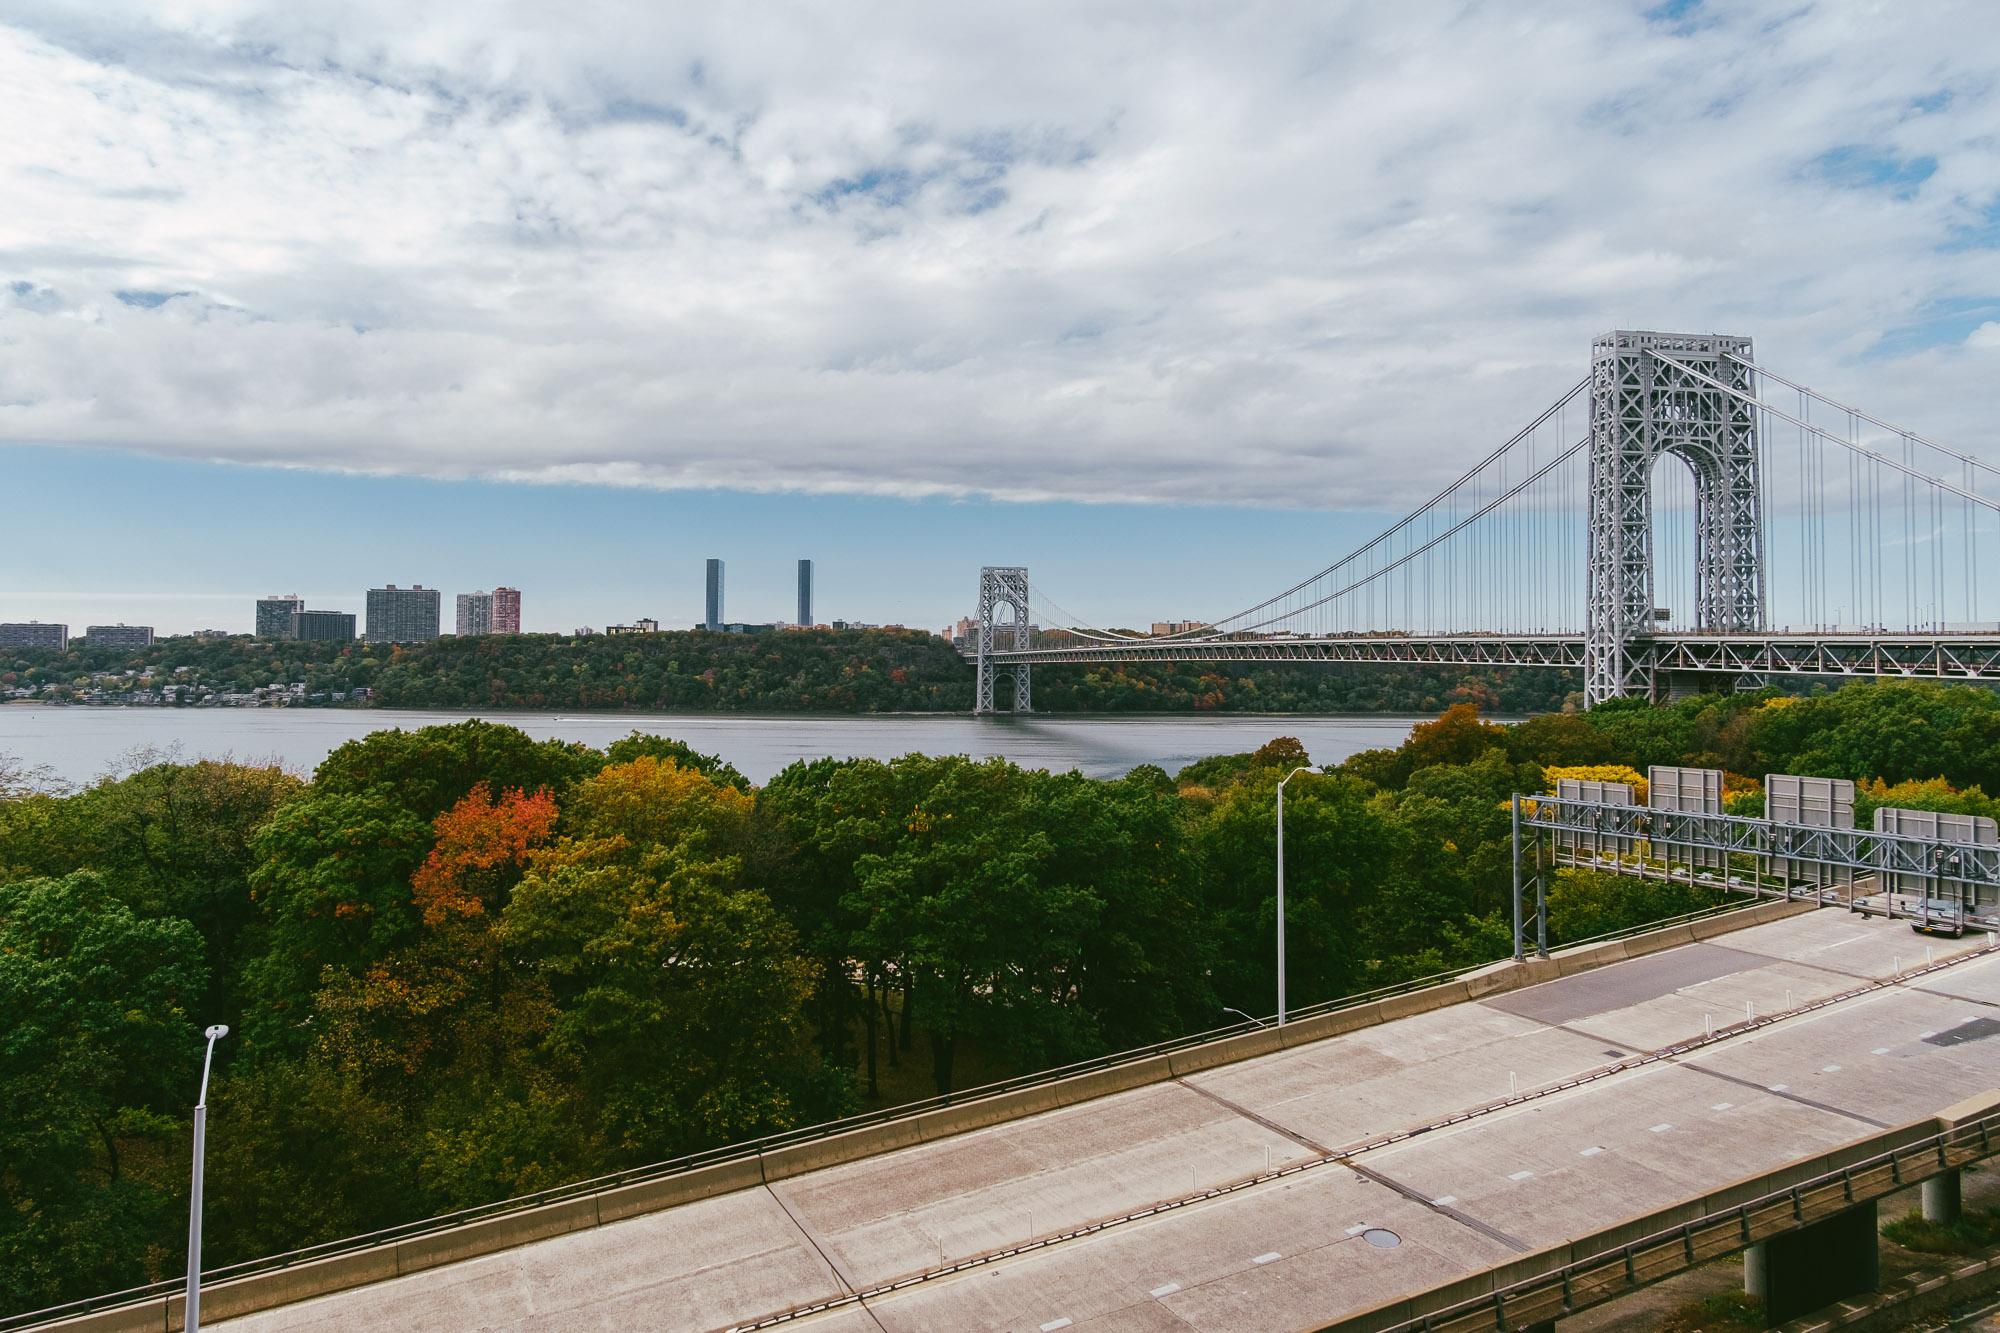 Cityscape in Washington Heights, Manhattan. Fuji X-pro1, 12mm Rokinon 12mm f/2.